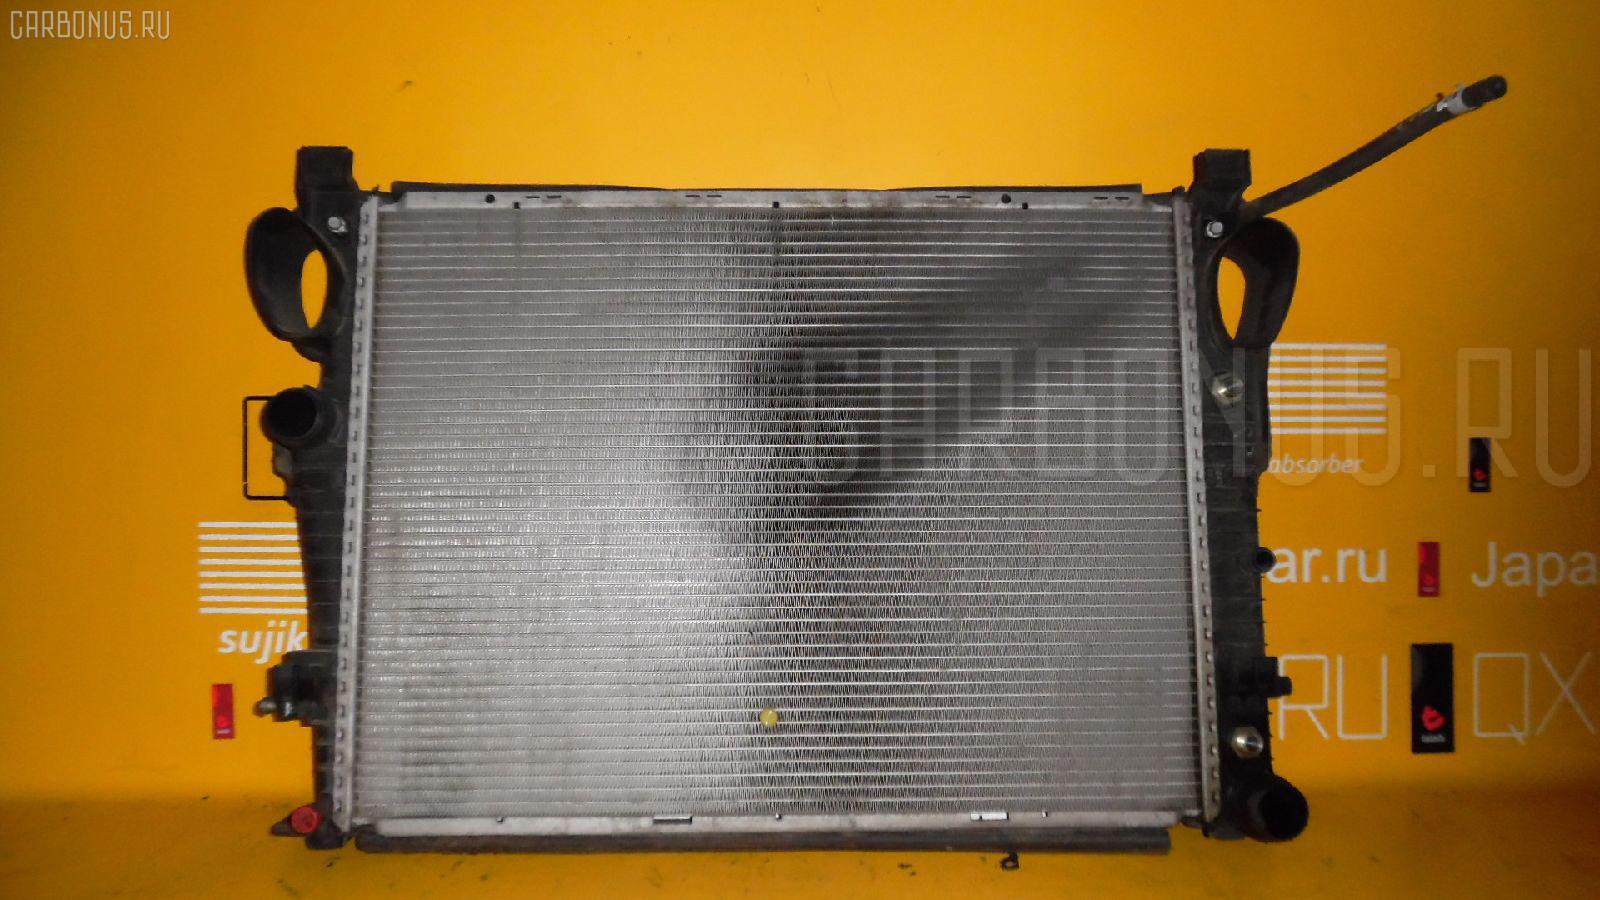 Радиатор ДВС MERCEDES-BENZ CL-CLASS C215.375 113.960 Фото 1